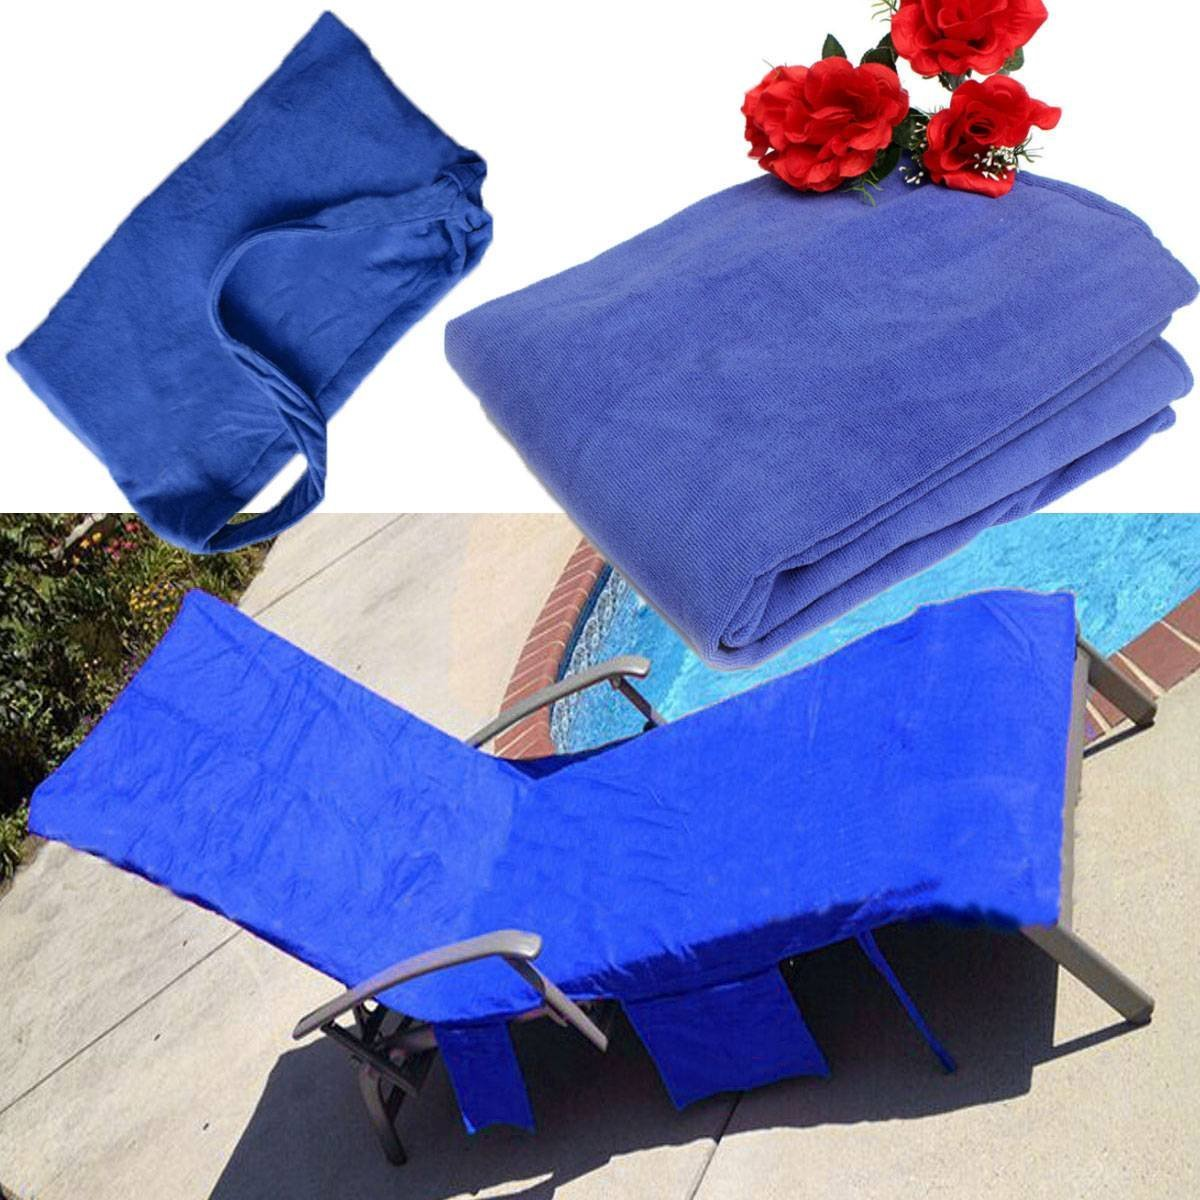 KING DO WAY Beach Chair Towel Lounge Sheet Pool Beach Chair Cover  Microfiber NEW